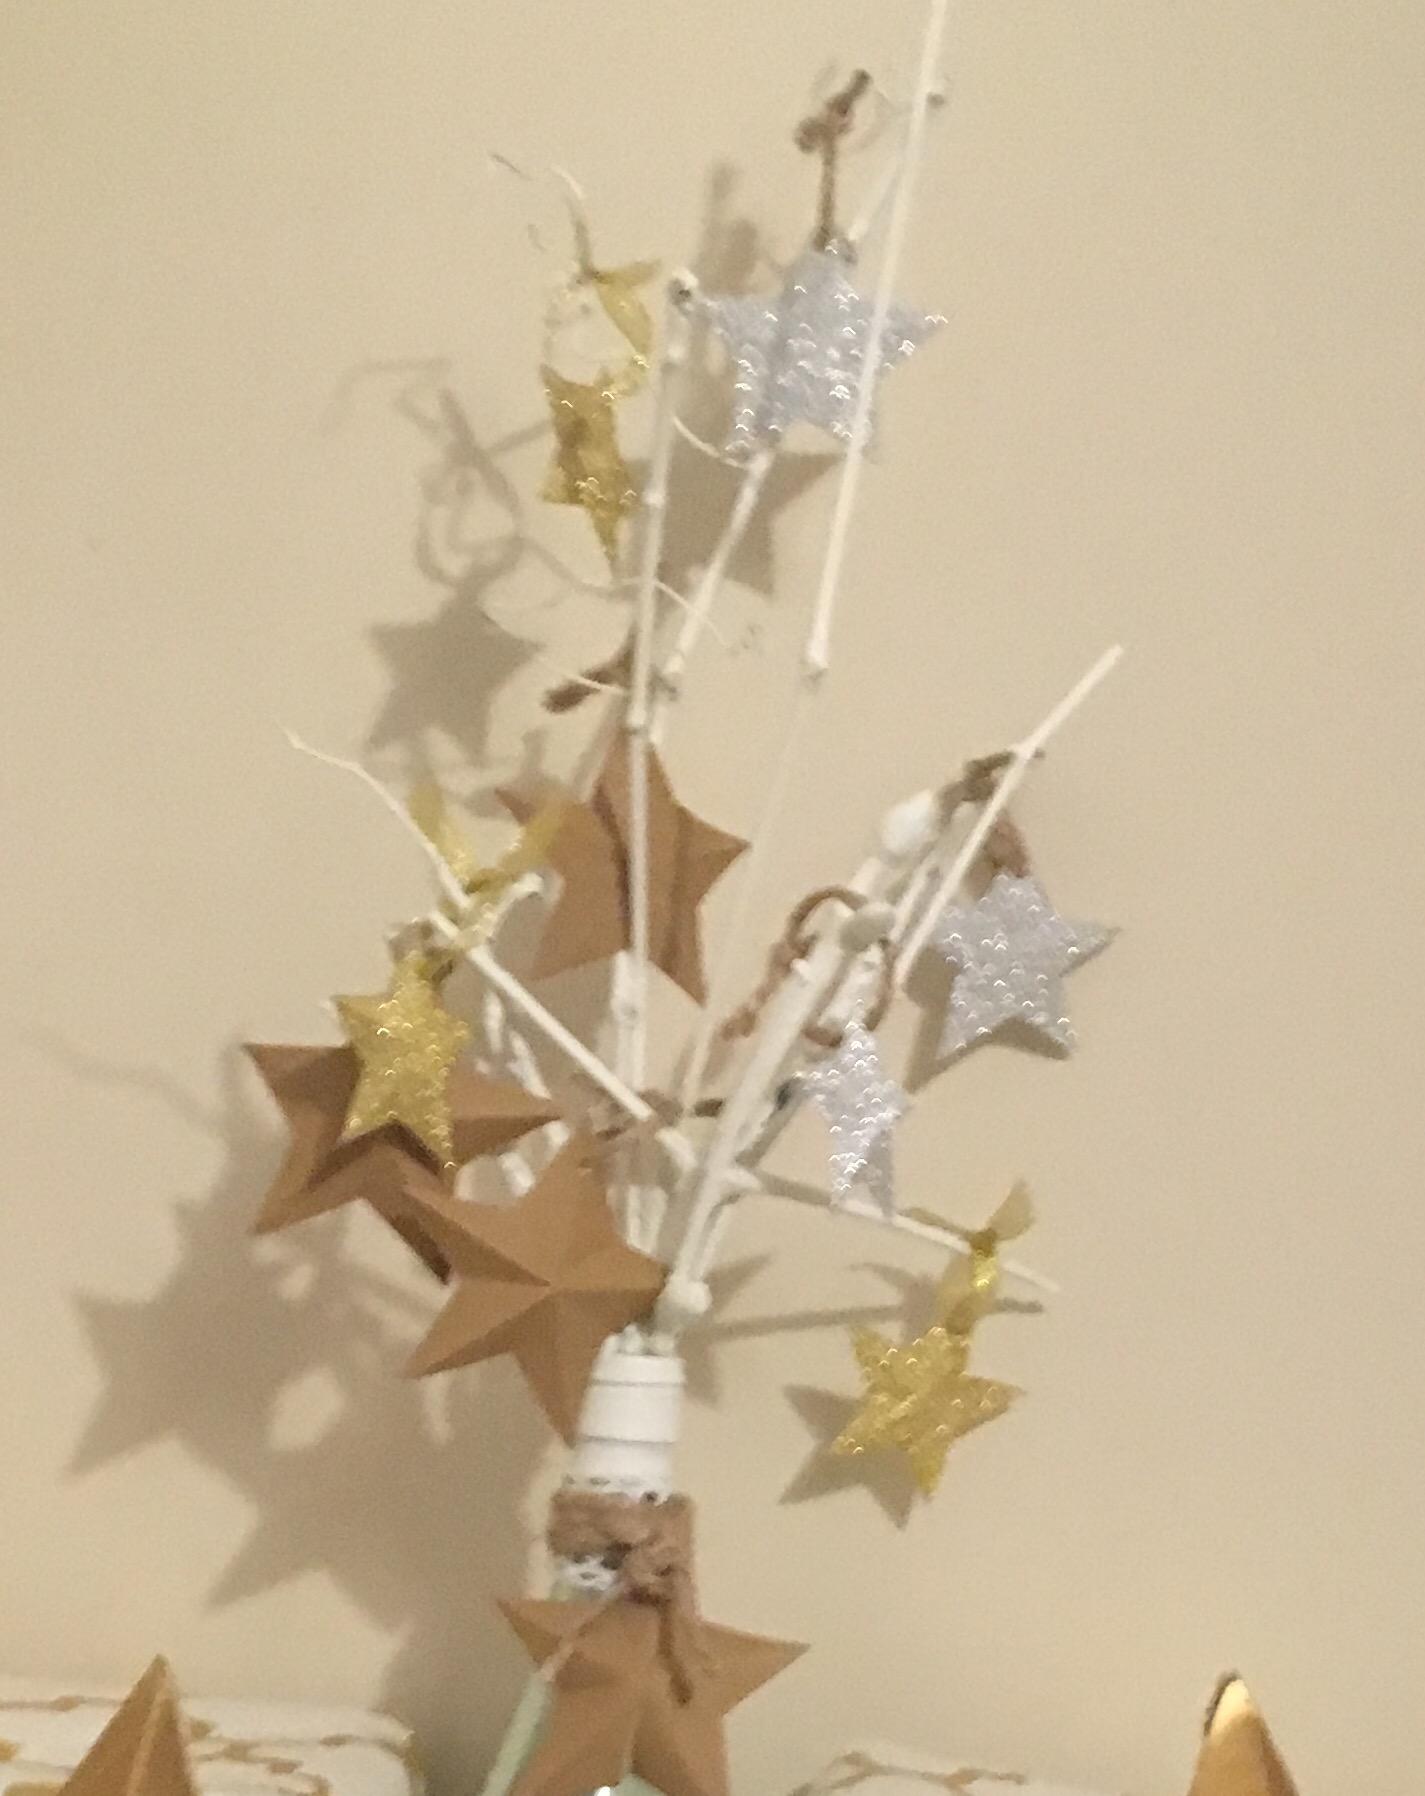 Haz una estrella navide a luminosa de cart n mimodemami for Decoracion luminosa navidena